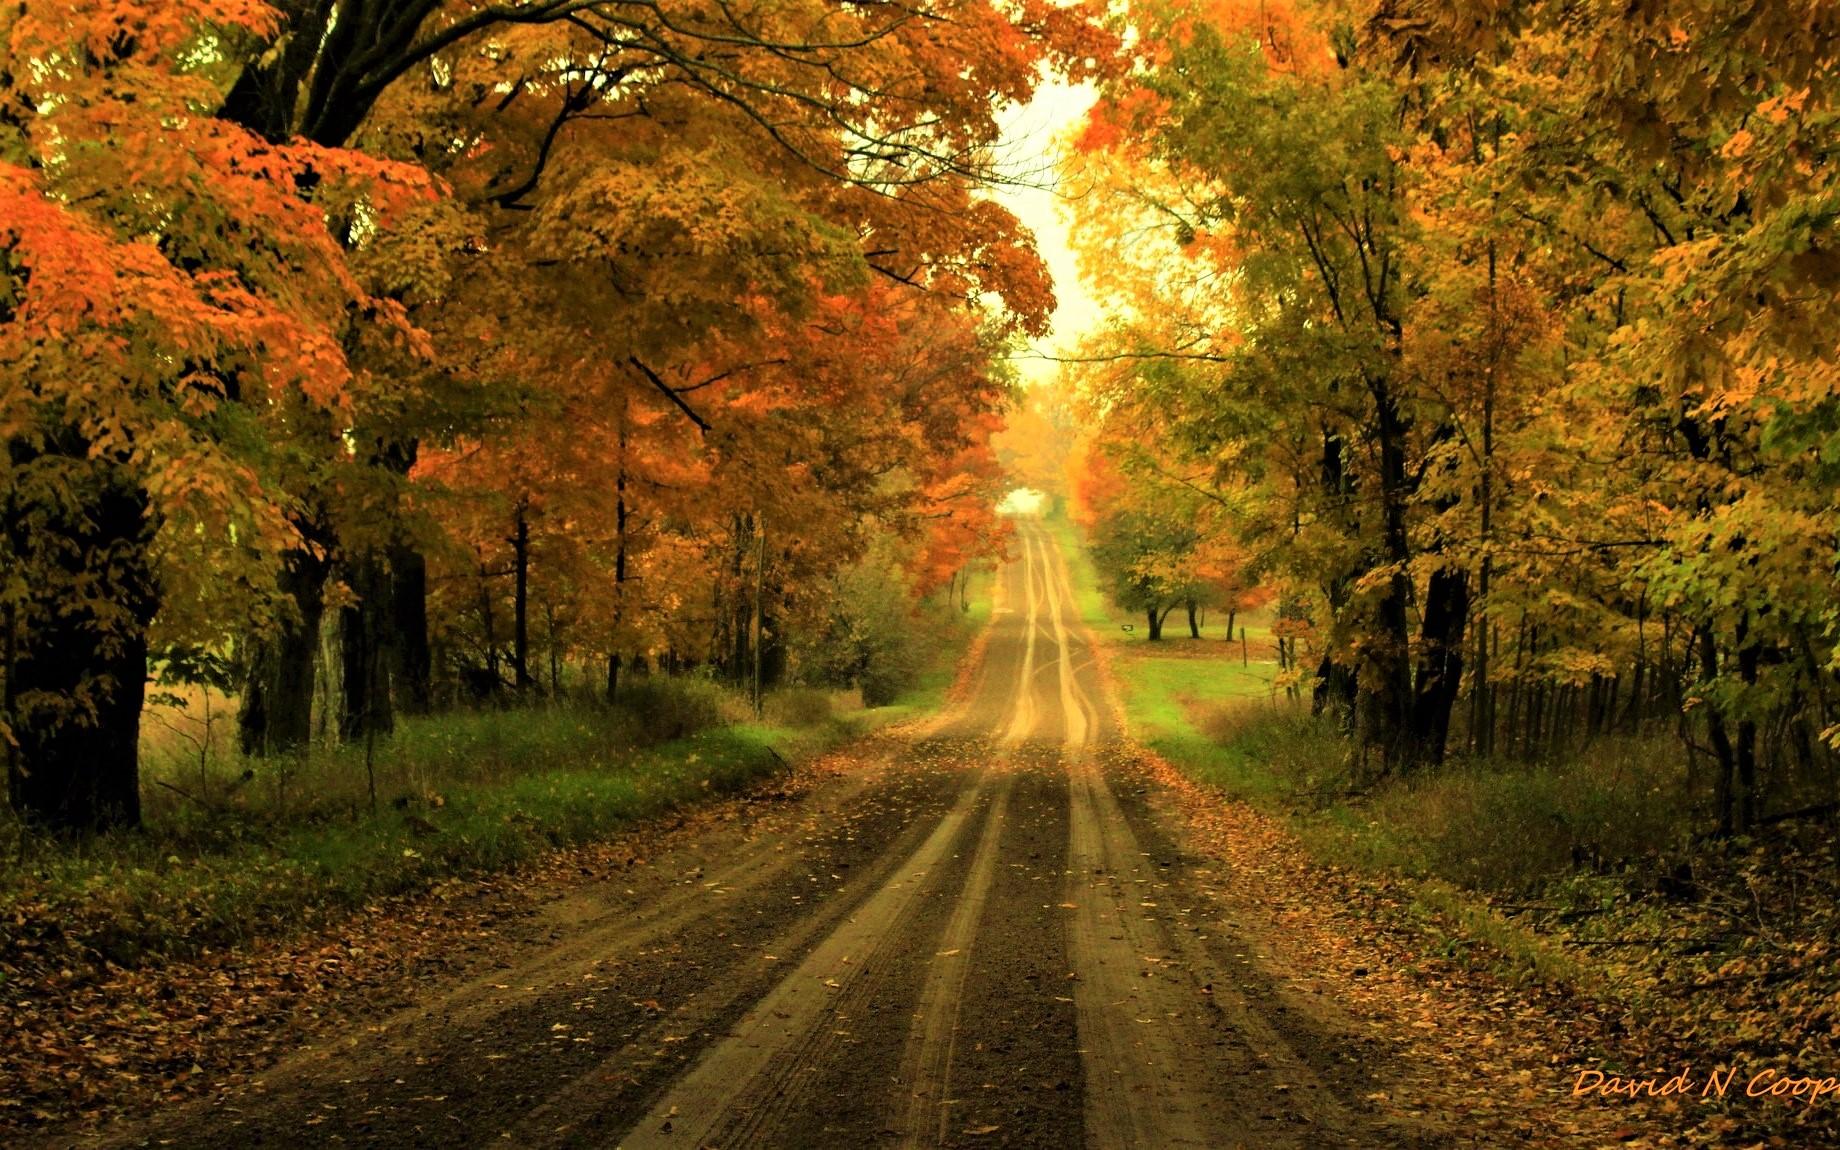 Road: Fall, Tree, Road, Foliage, Dirt Road